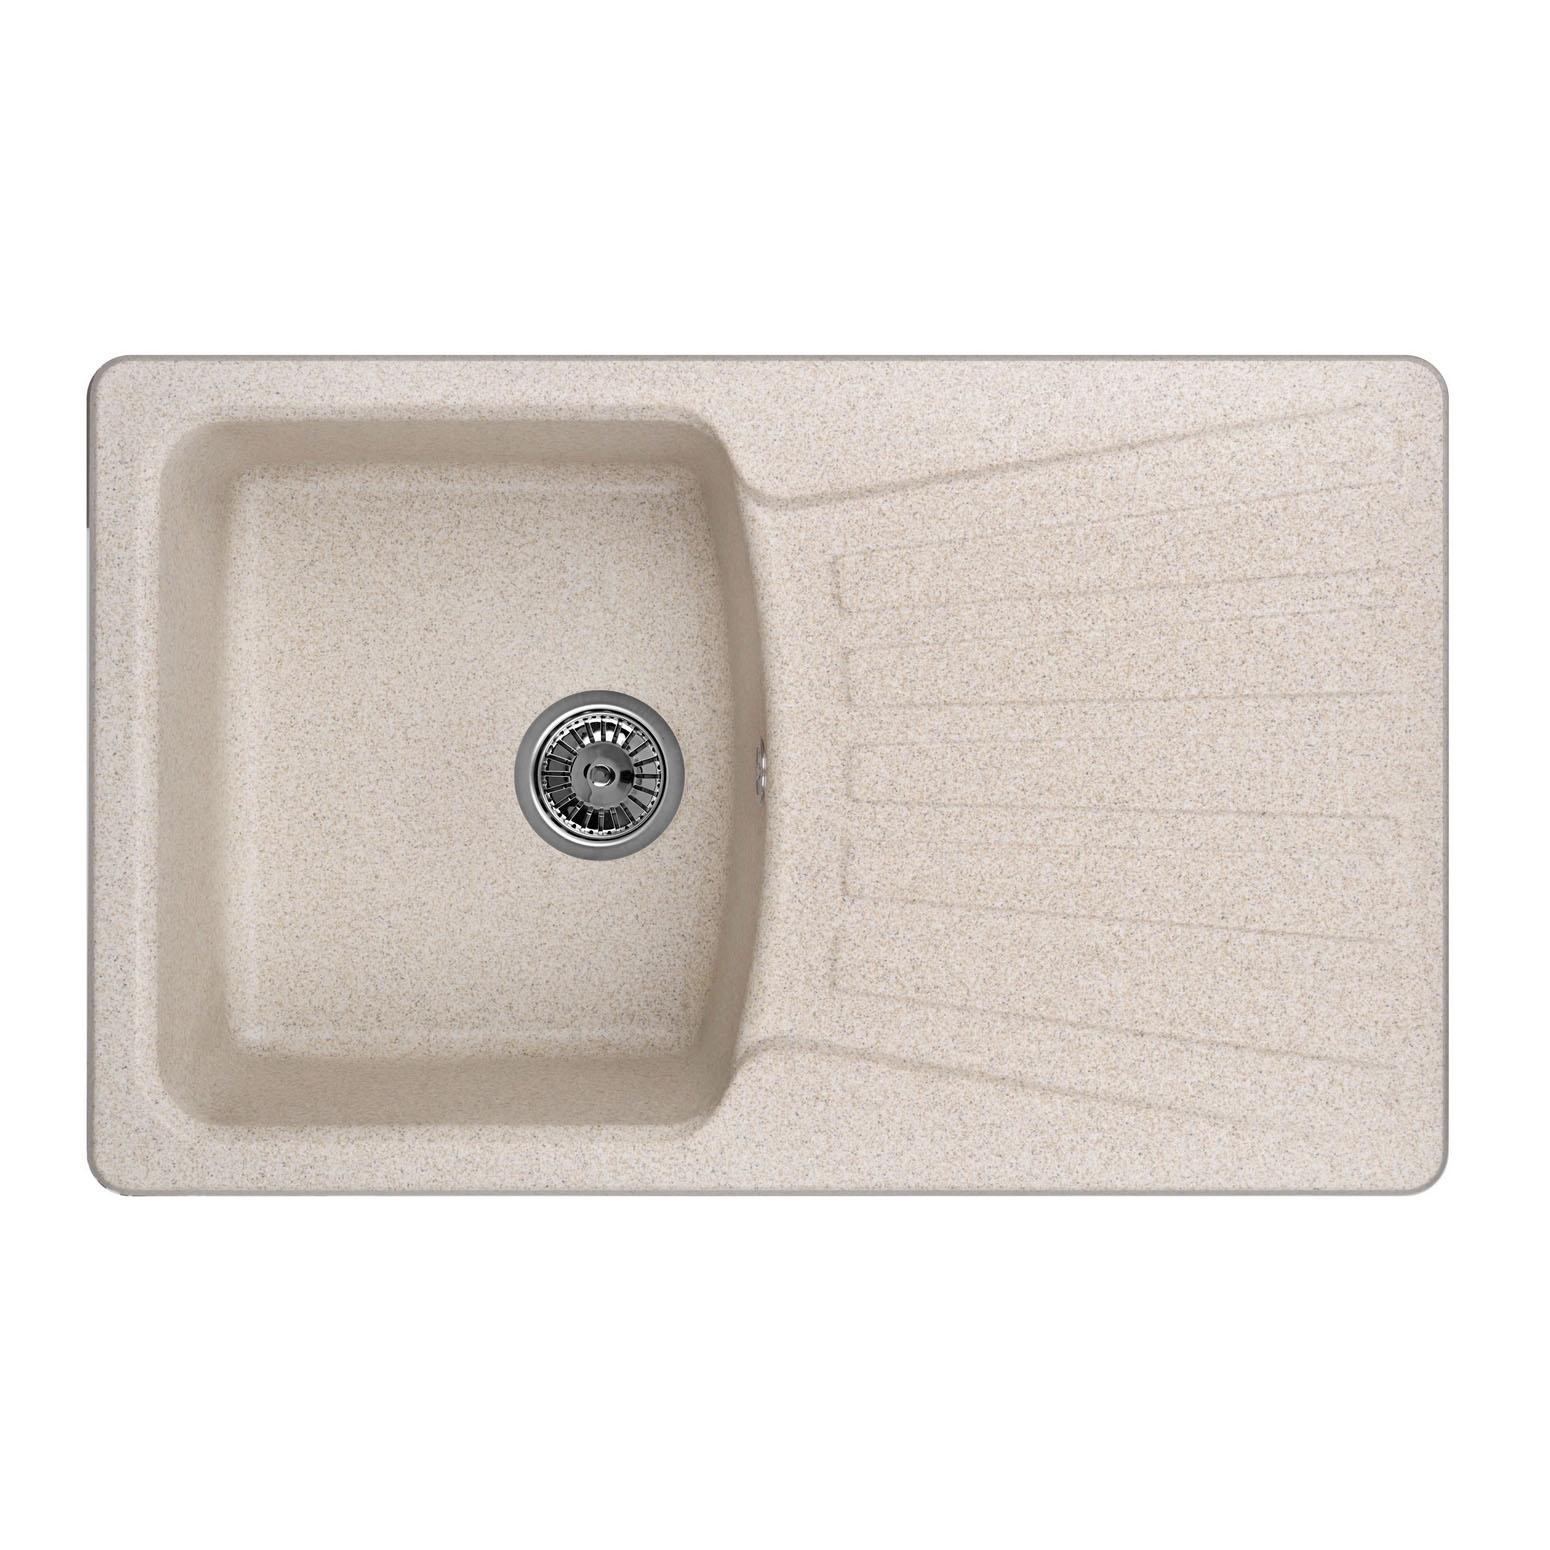 Кухонная мойка Granula GR-8001 790х500 классик посуда кухонная